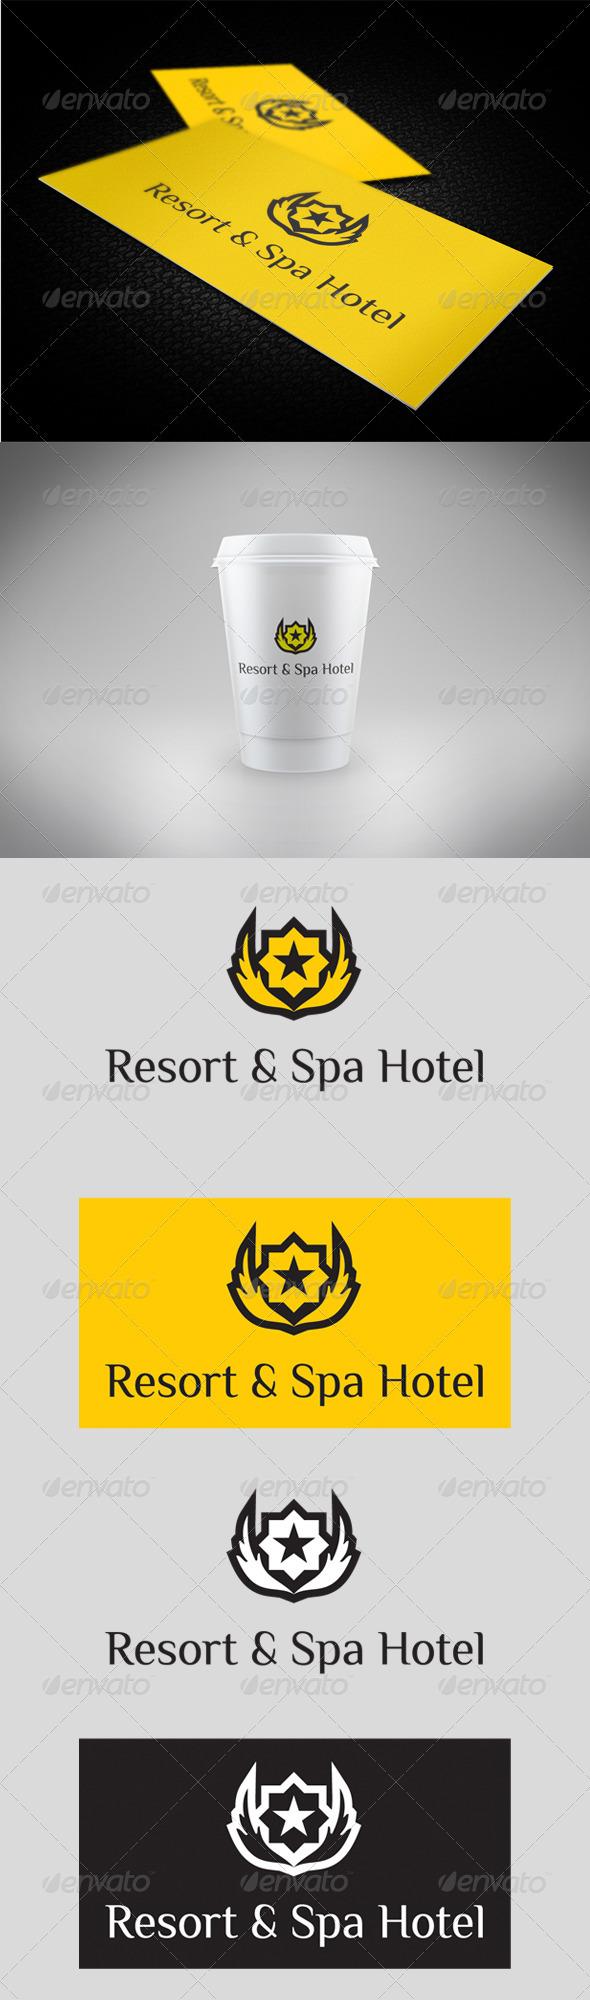 GraphicRiver Resort & Spa Hotel Logo 3533852